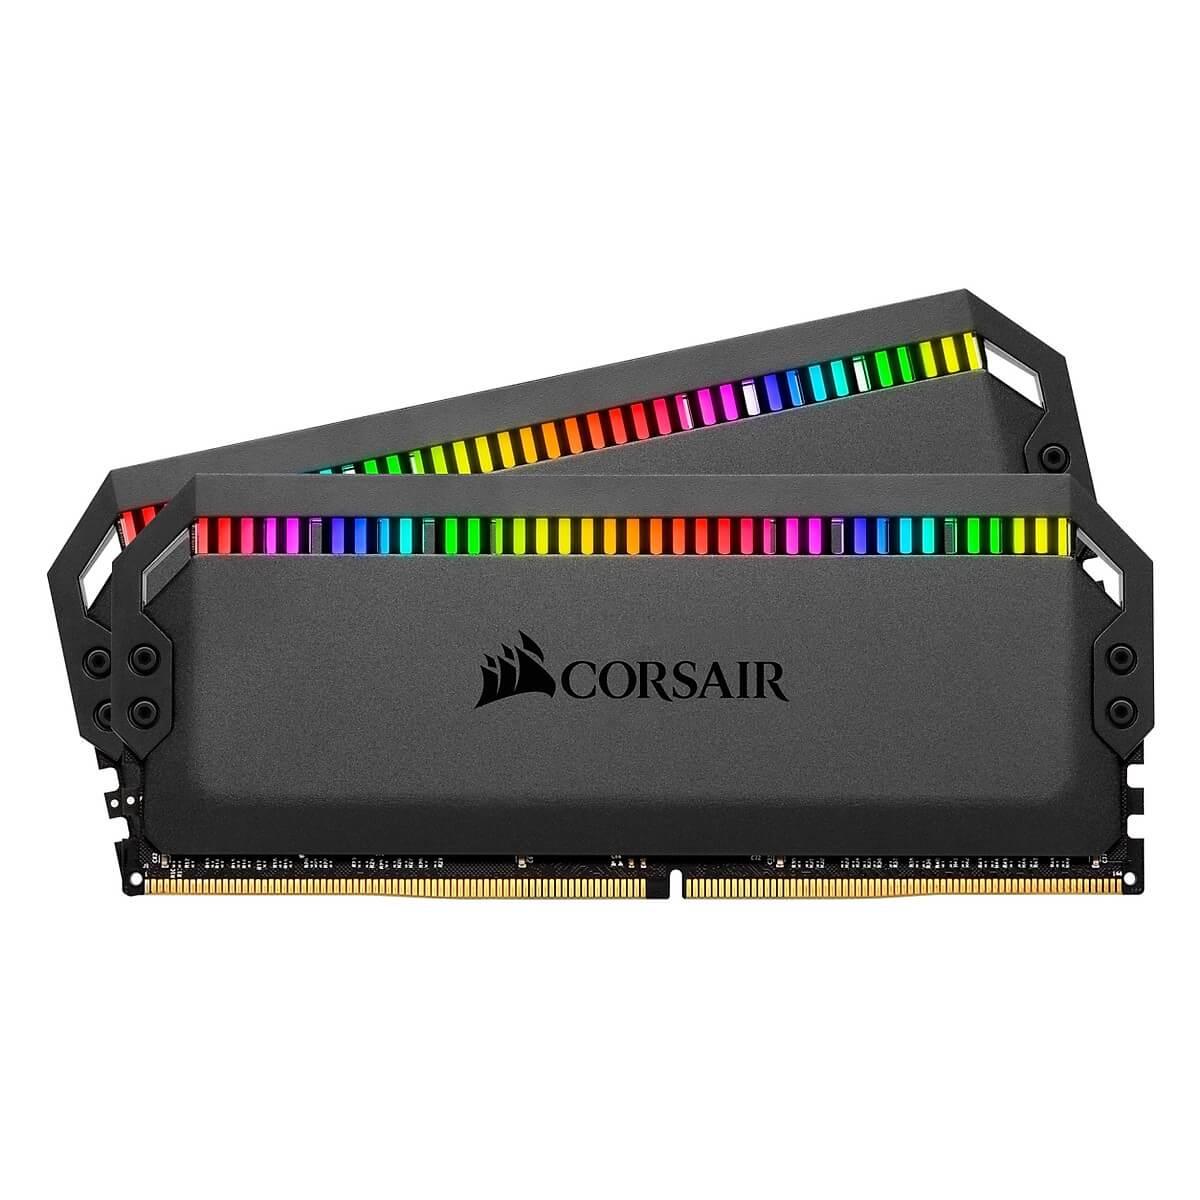 RAM Corsair Dominator Platinum RGB 32GB DDR4 3000MHz CMT32GX4M2C3000C15